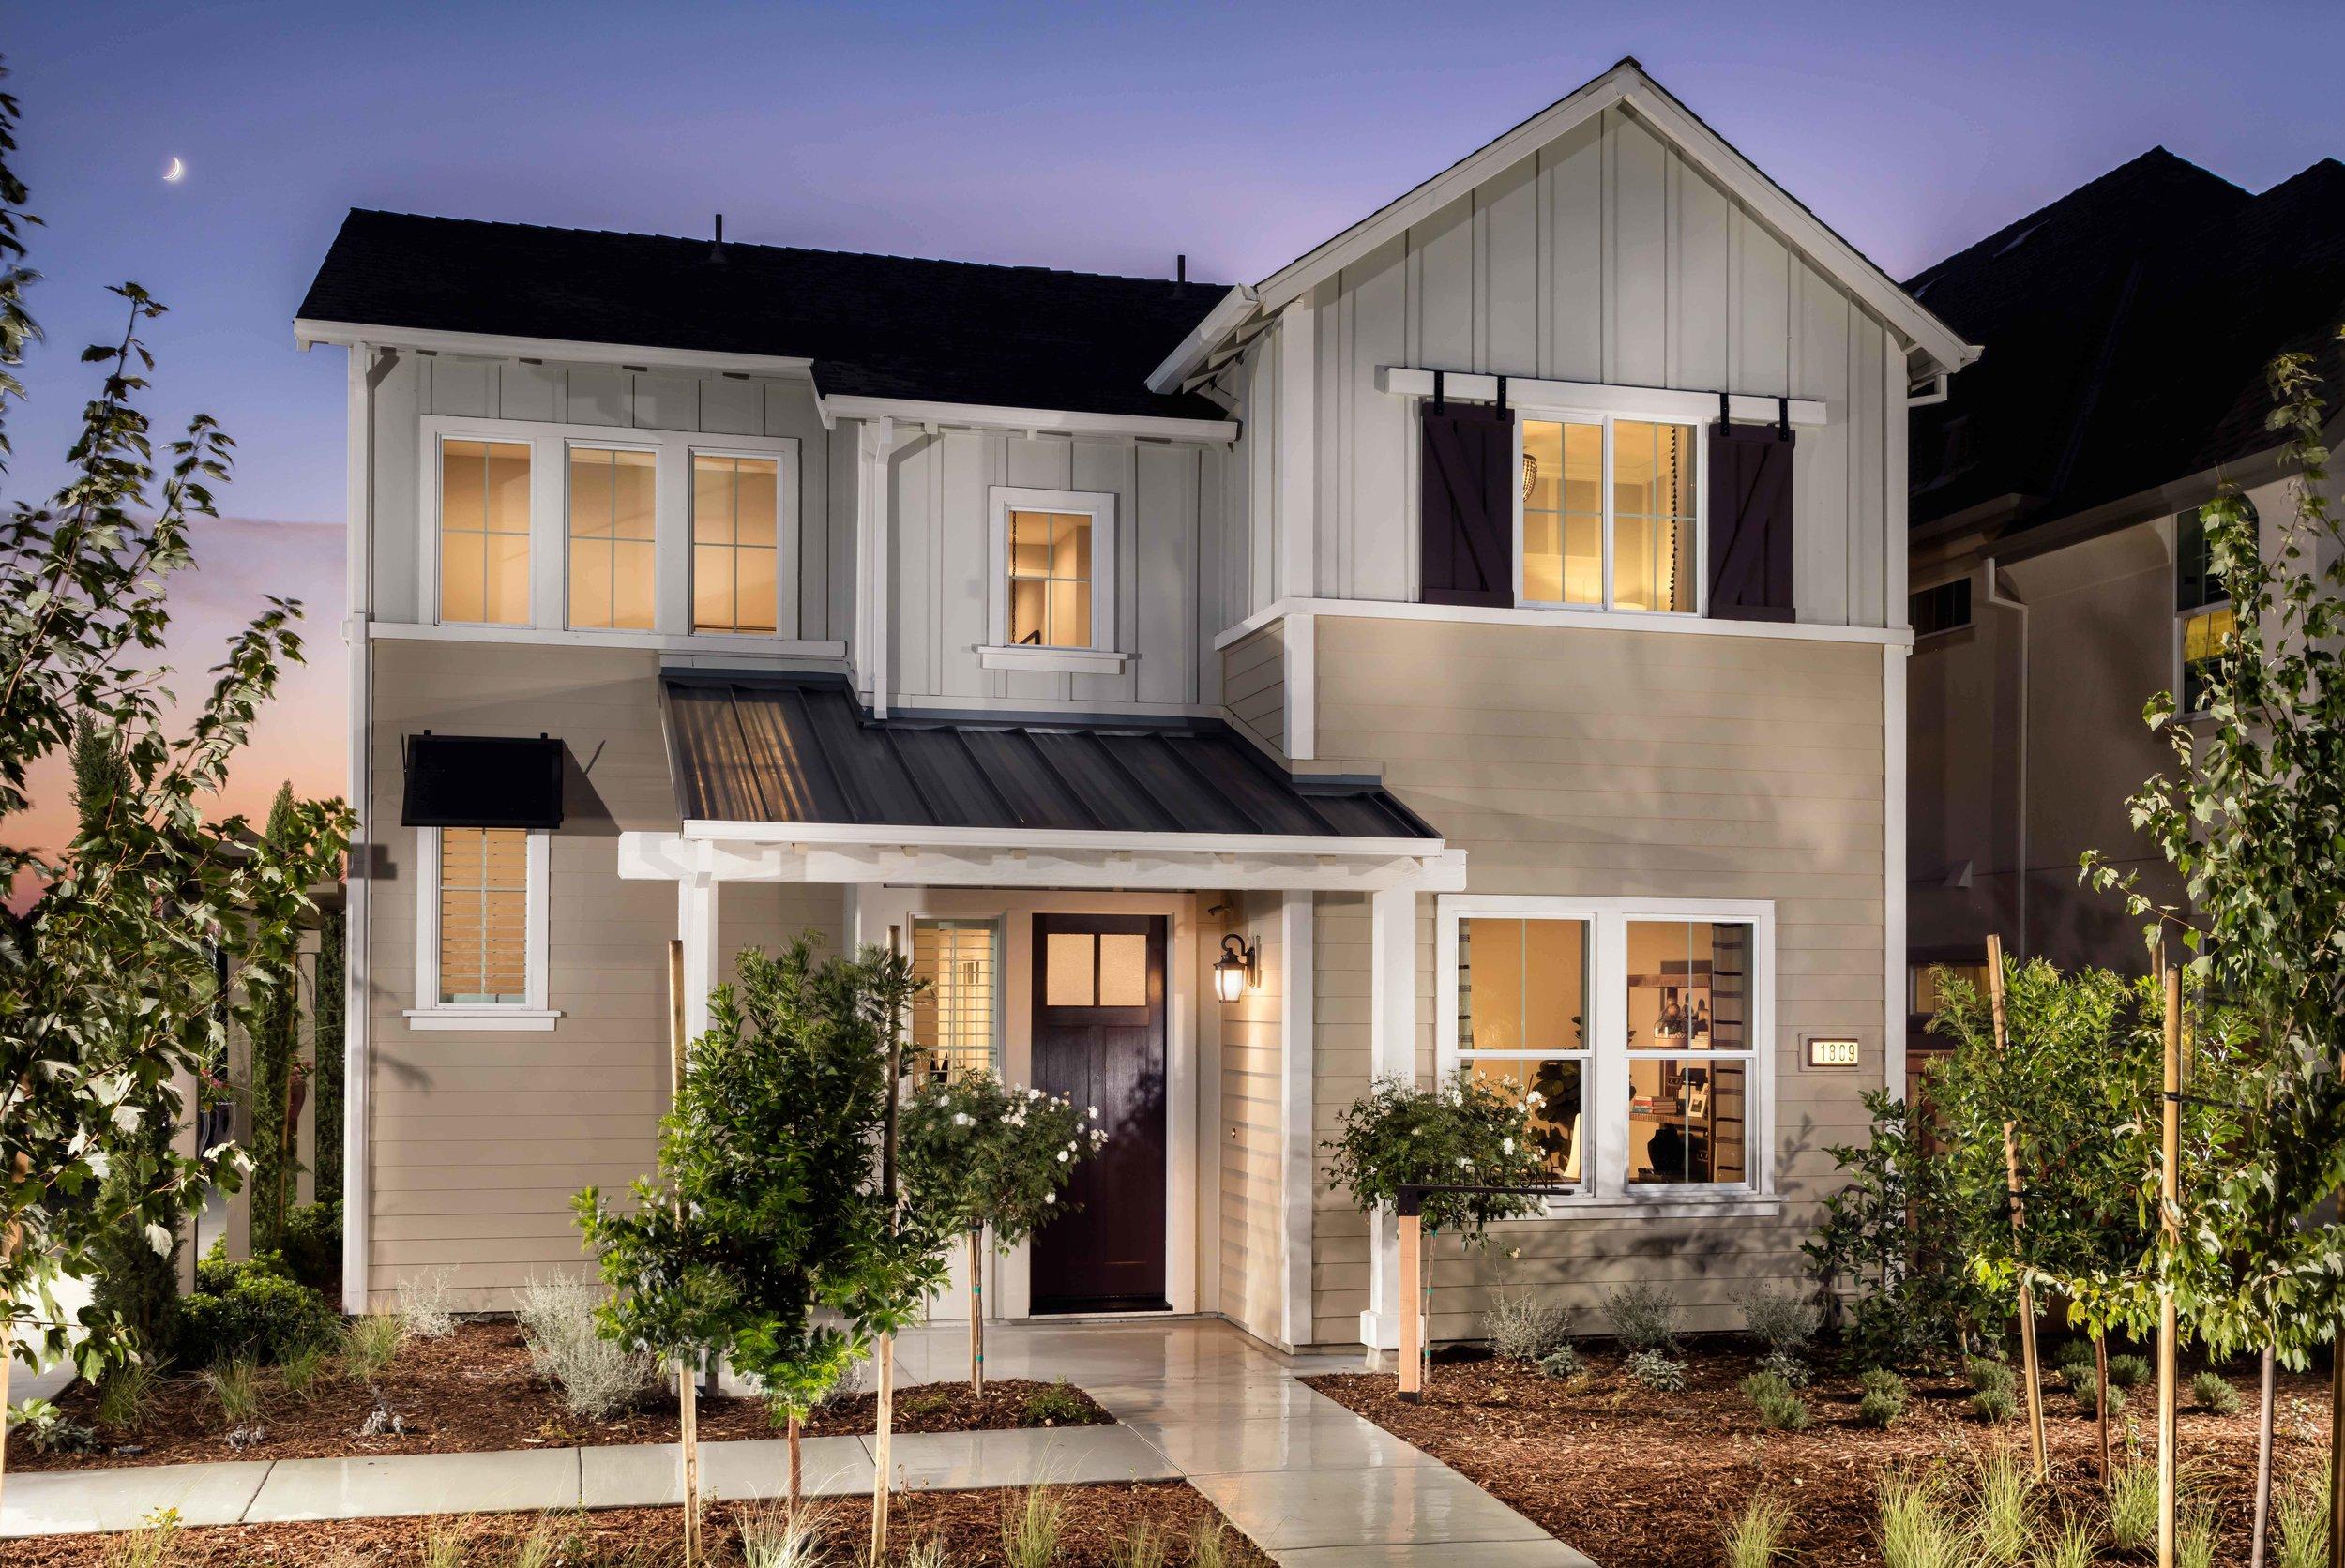 Persimmion   | Davis, California